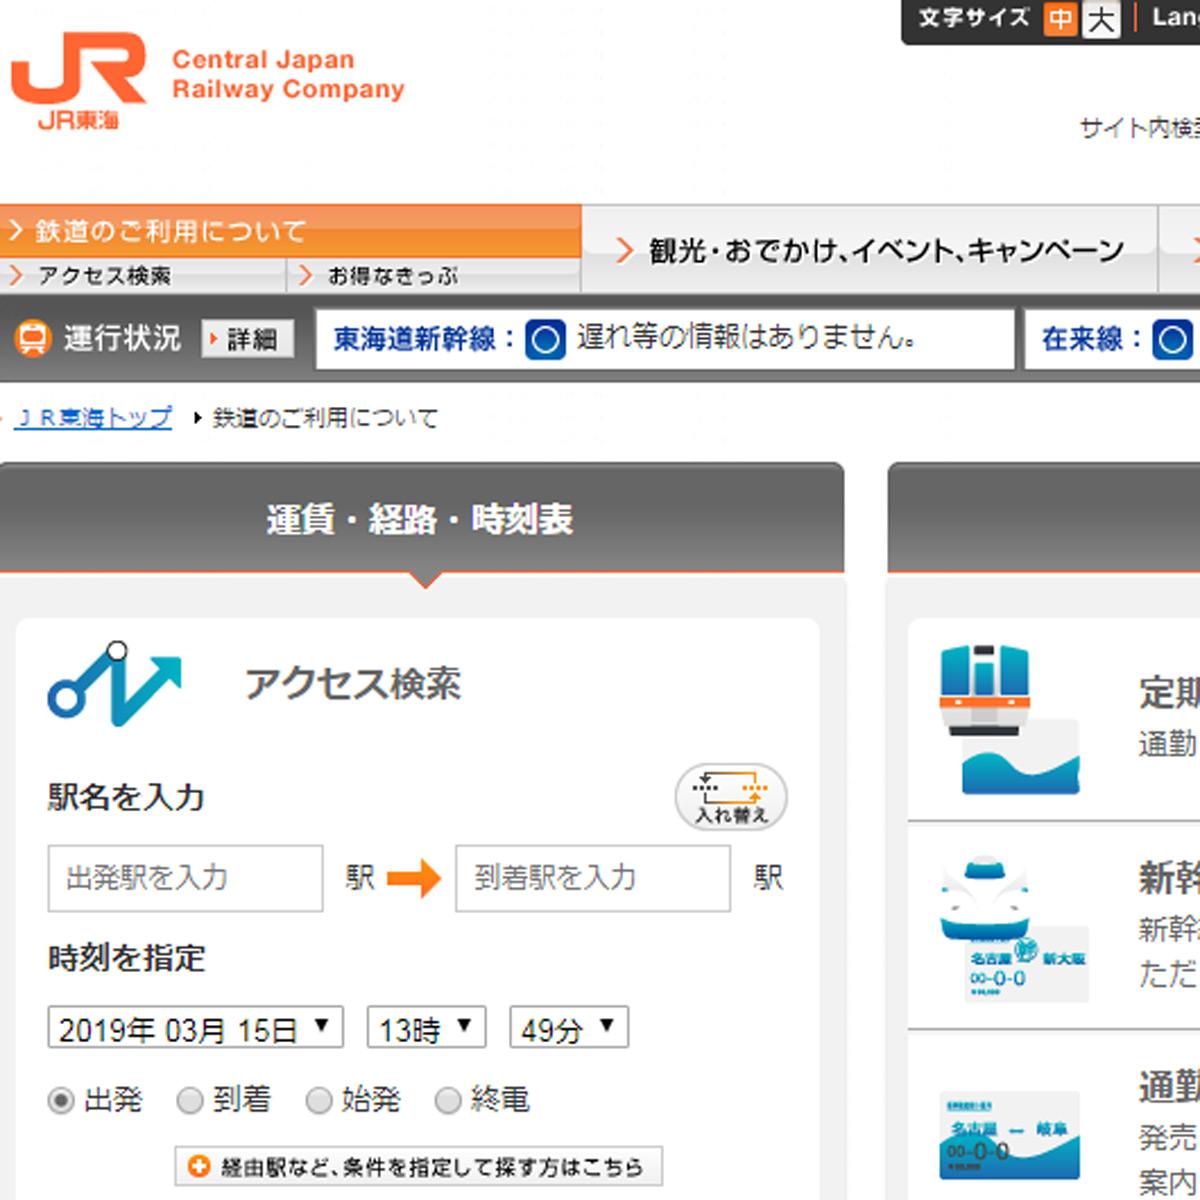 Jr 東海 運行 情報 JR東海の遅延・運行状況 - 駅探